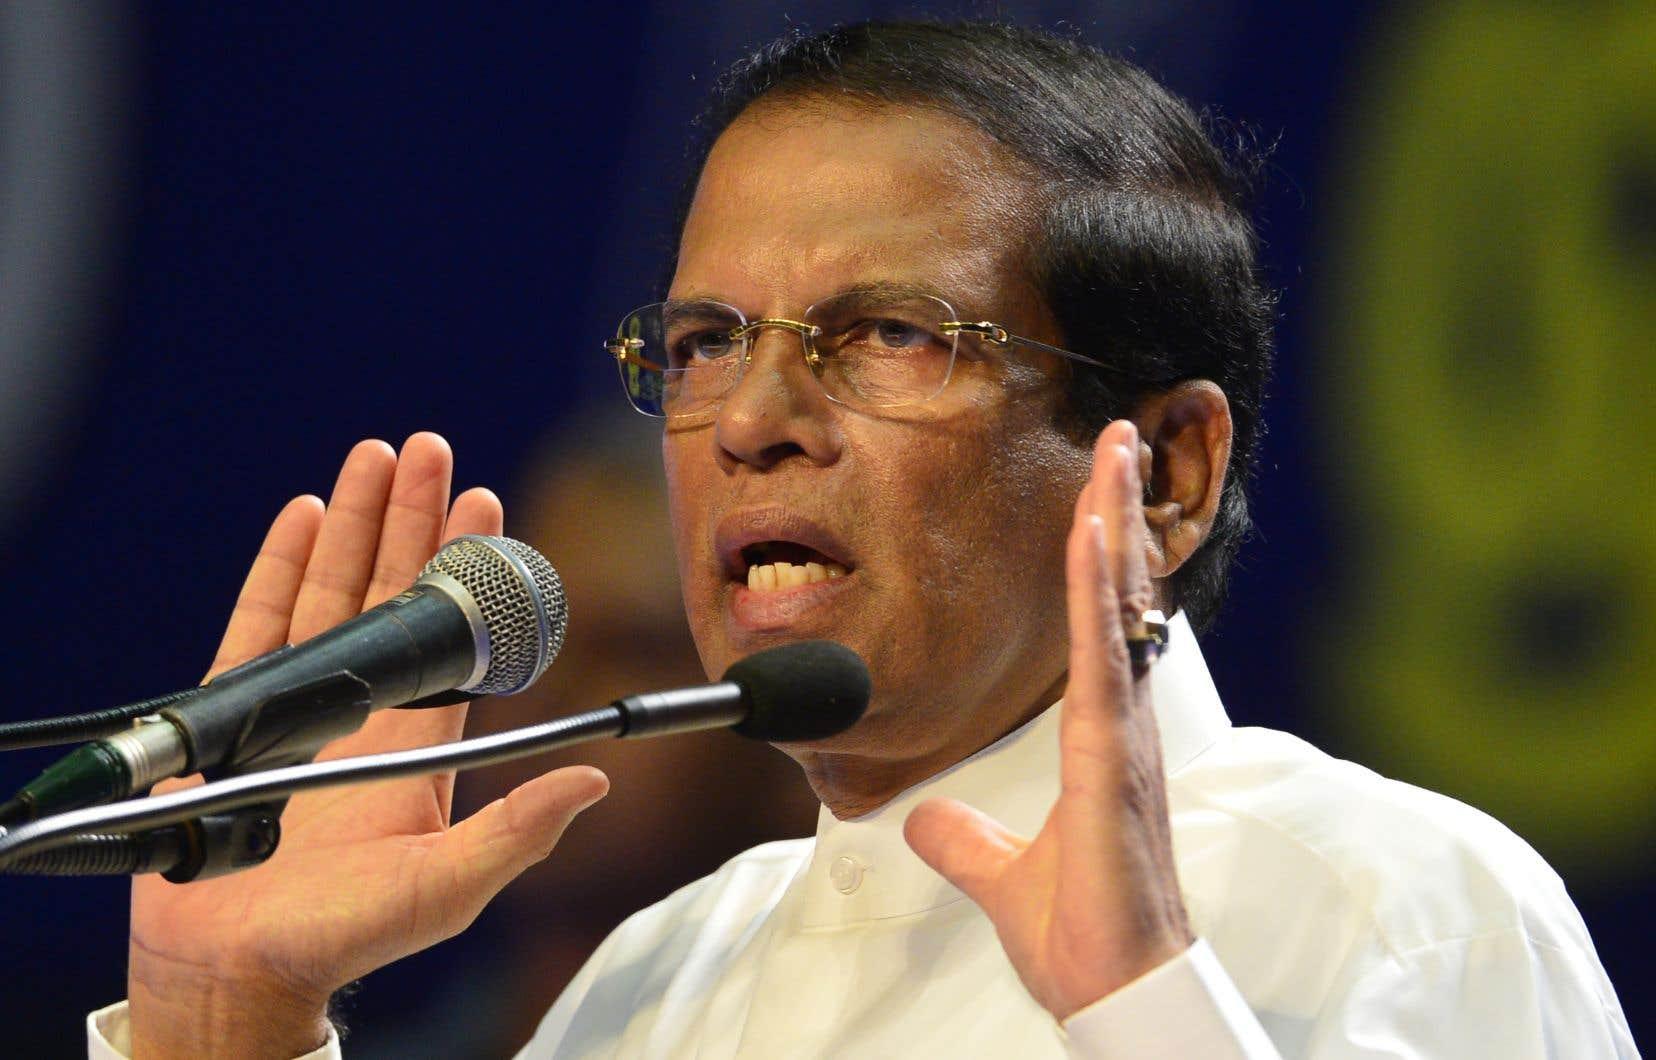 Le président sri-lankais, Maithripala Sirisena